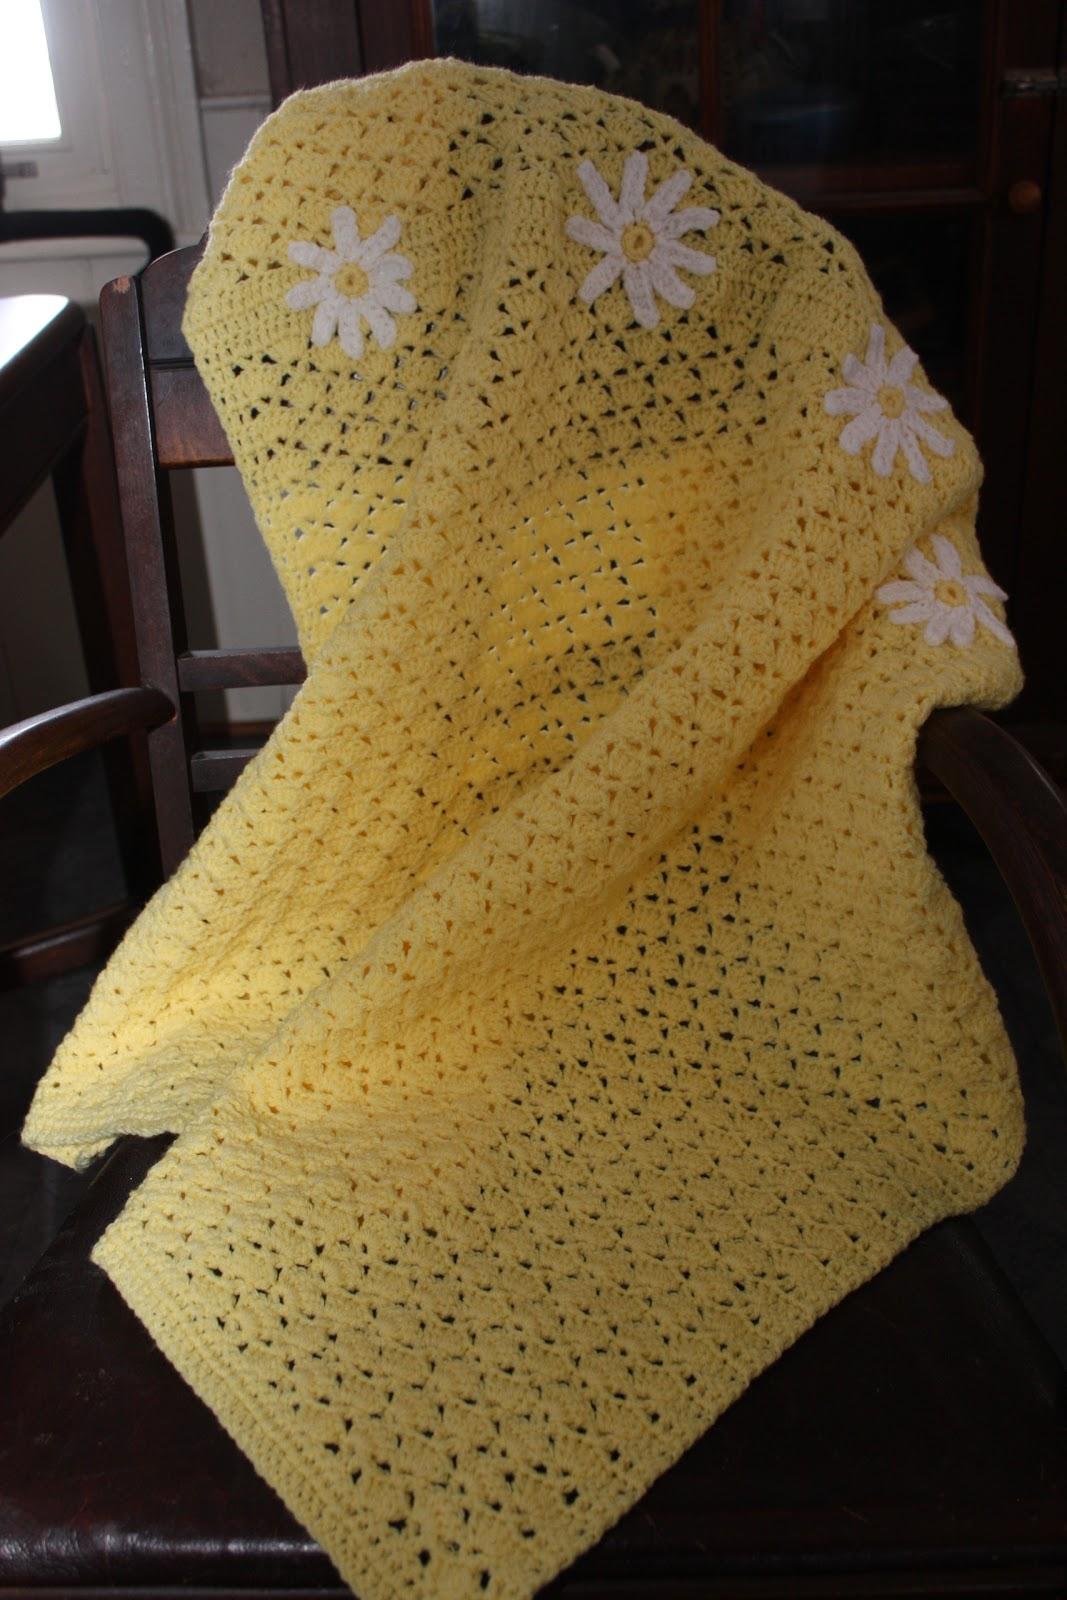 Free Crochet Pattern For Daisy Blanket : Chasing Chickens: Free Crochet Pattern - Daisy Baby-ghan